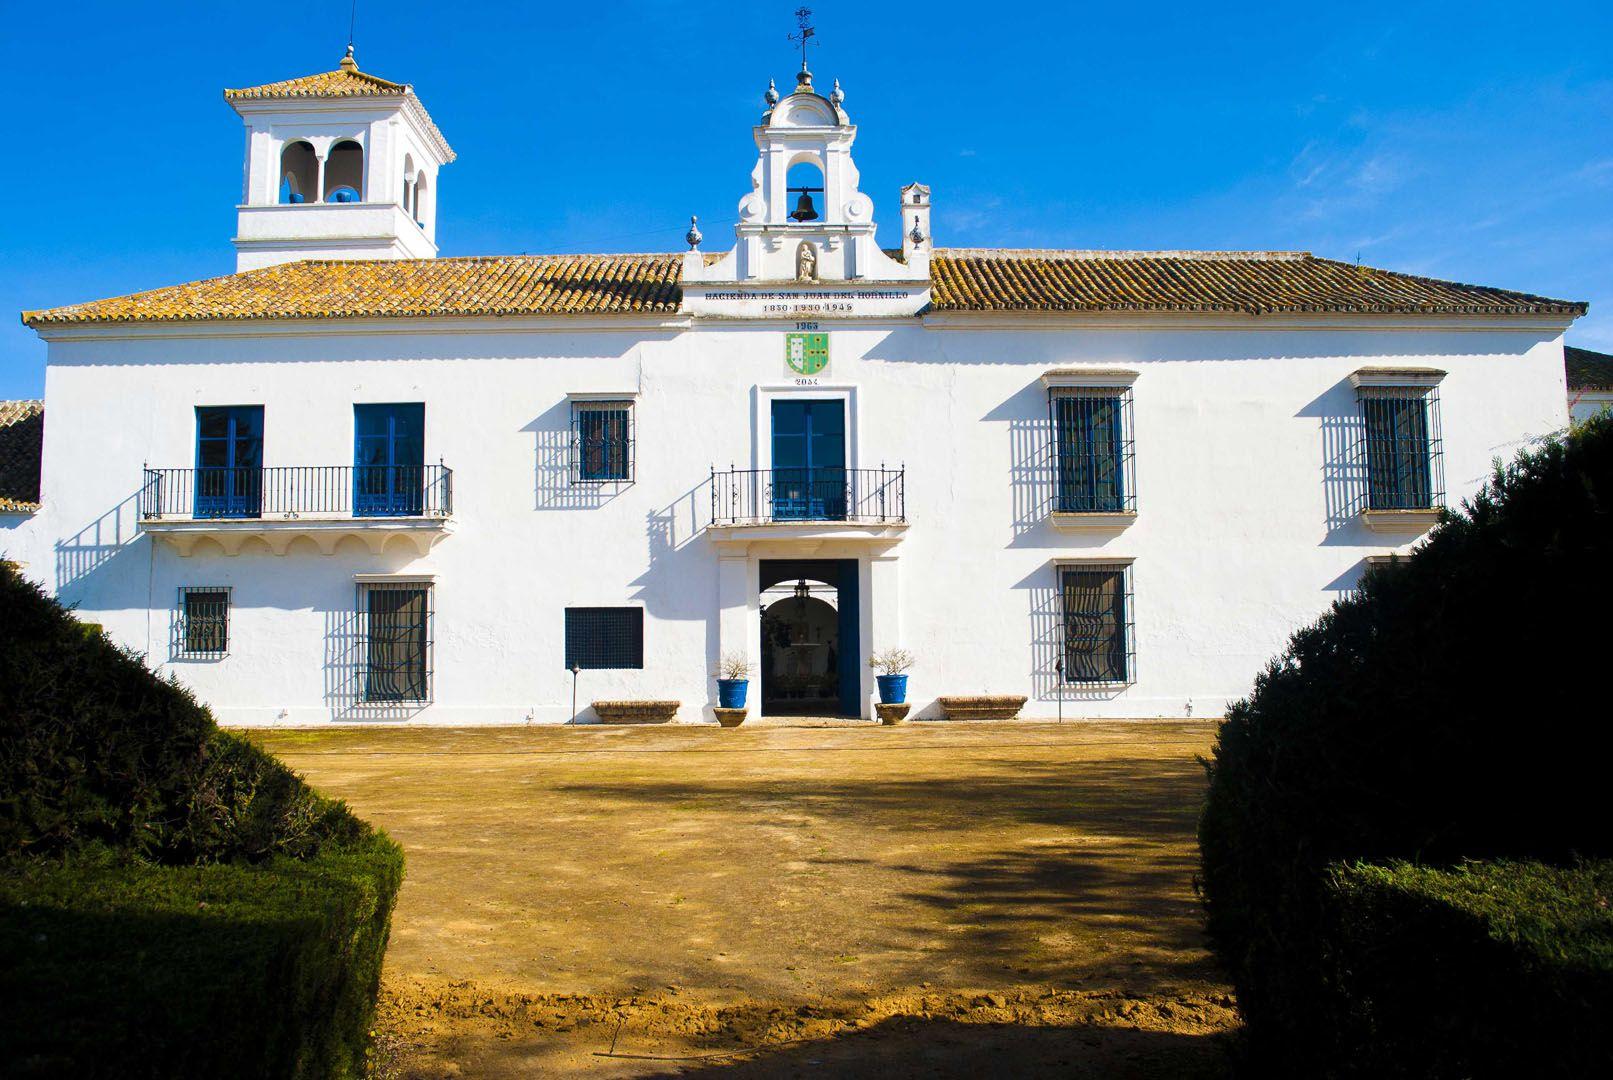 Pin de jose velutini en fachada cortijo en 2019 cortijos for Fotos de fachadas de casas andaluzas